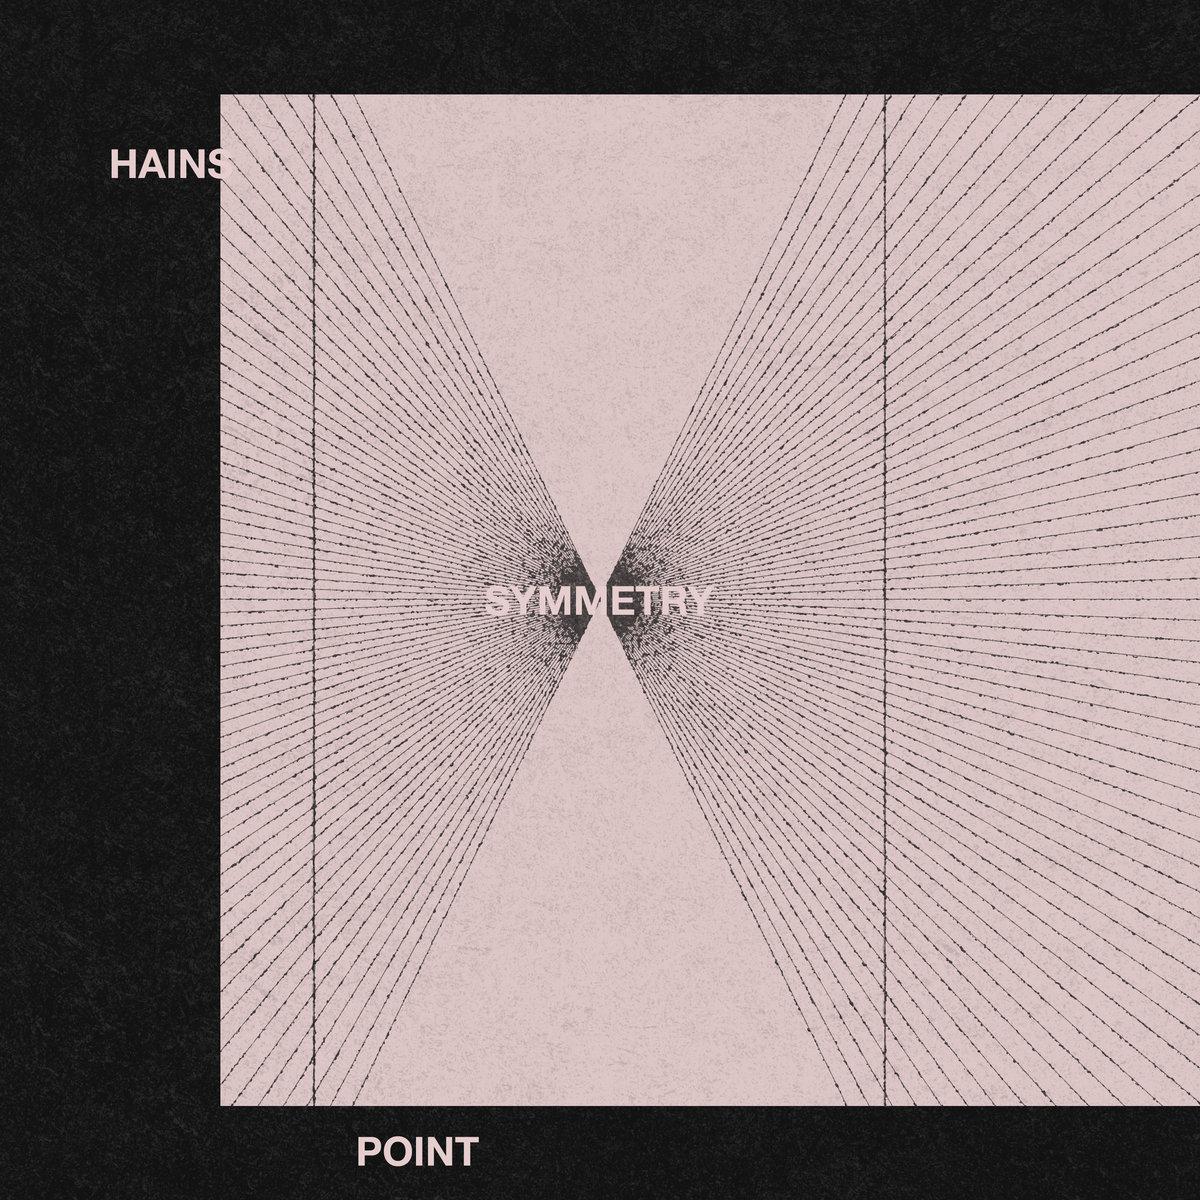 Hains Point — Symmetry